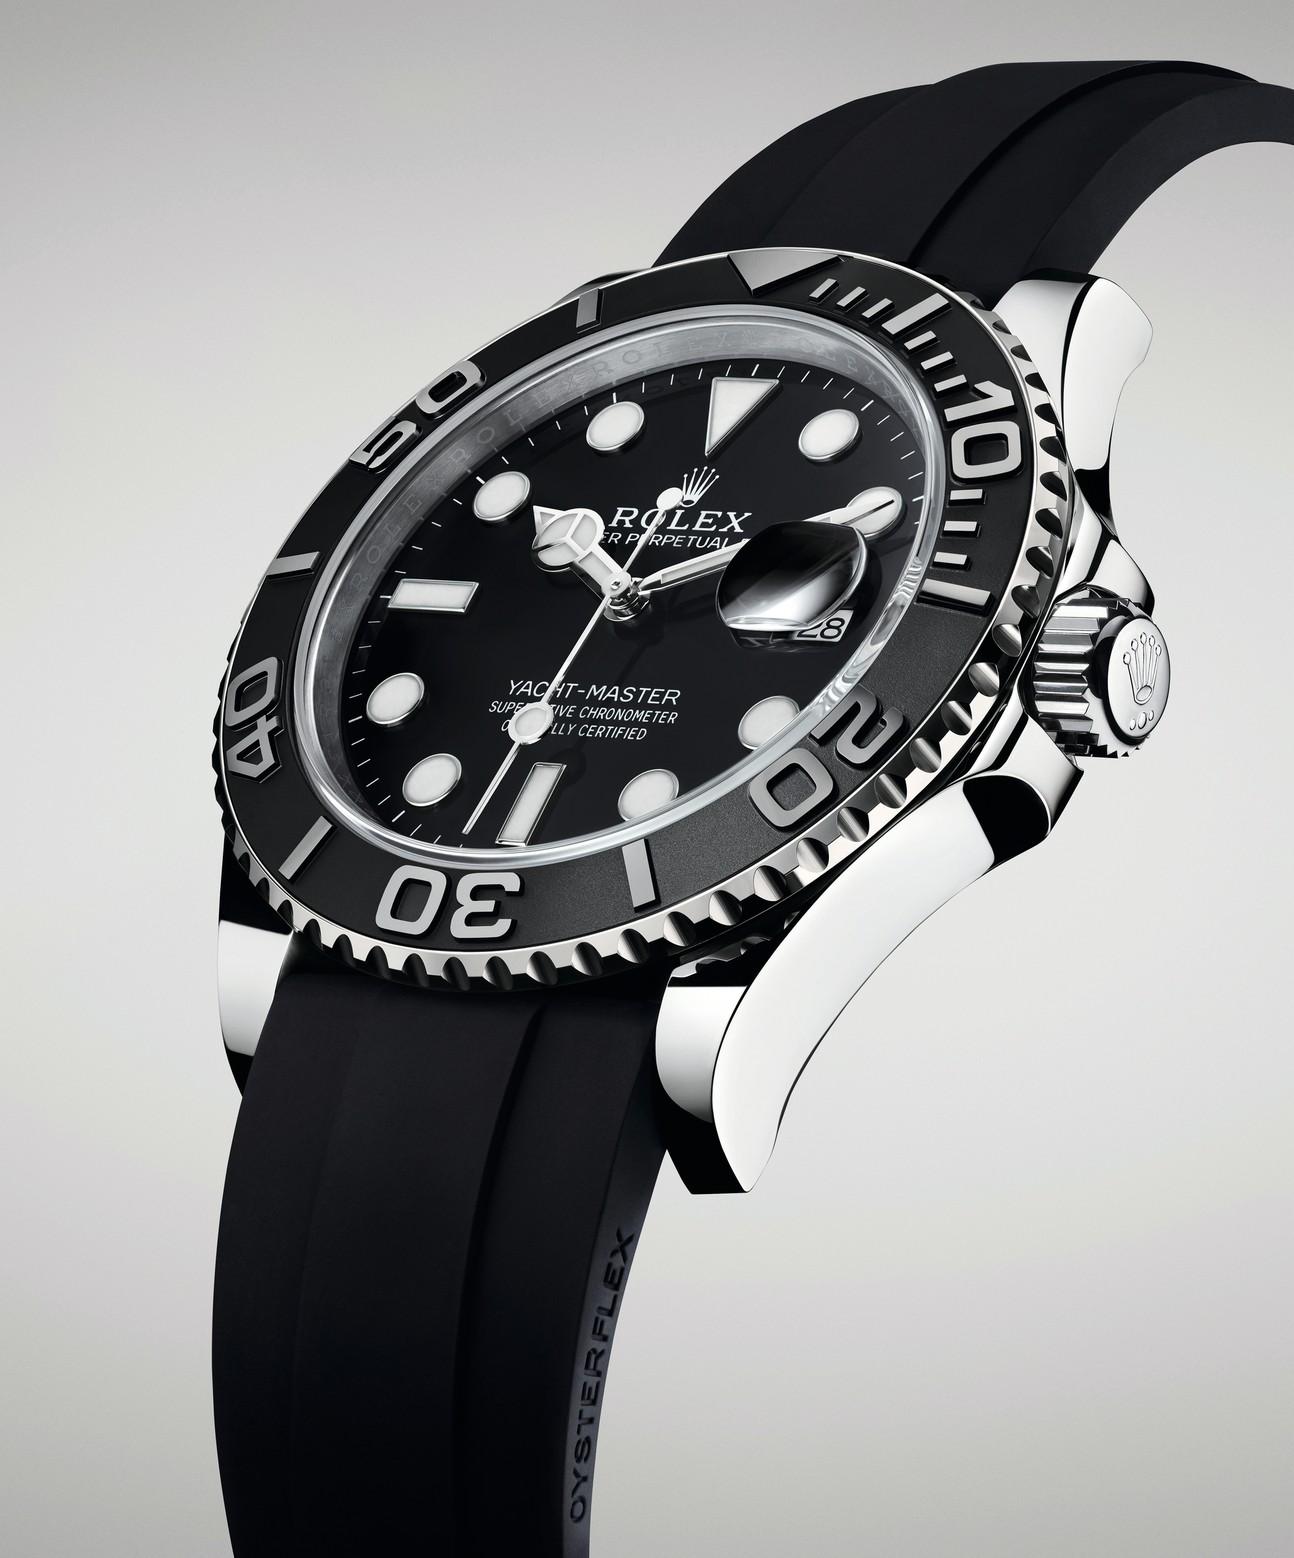 Rolex_Yacht-Master_42_2019_M226659-0002_1901ac_005